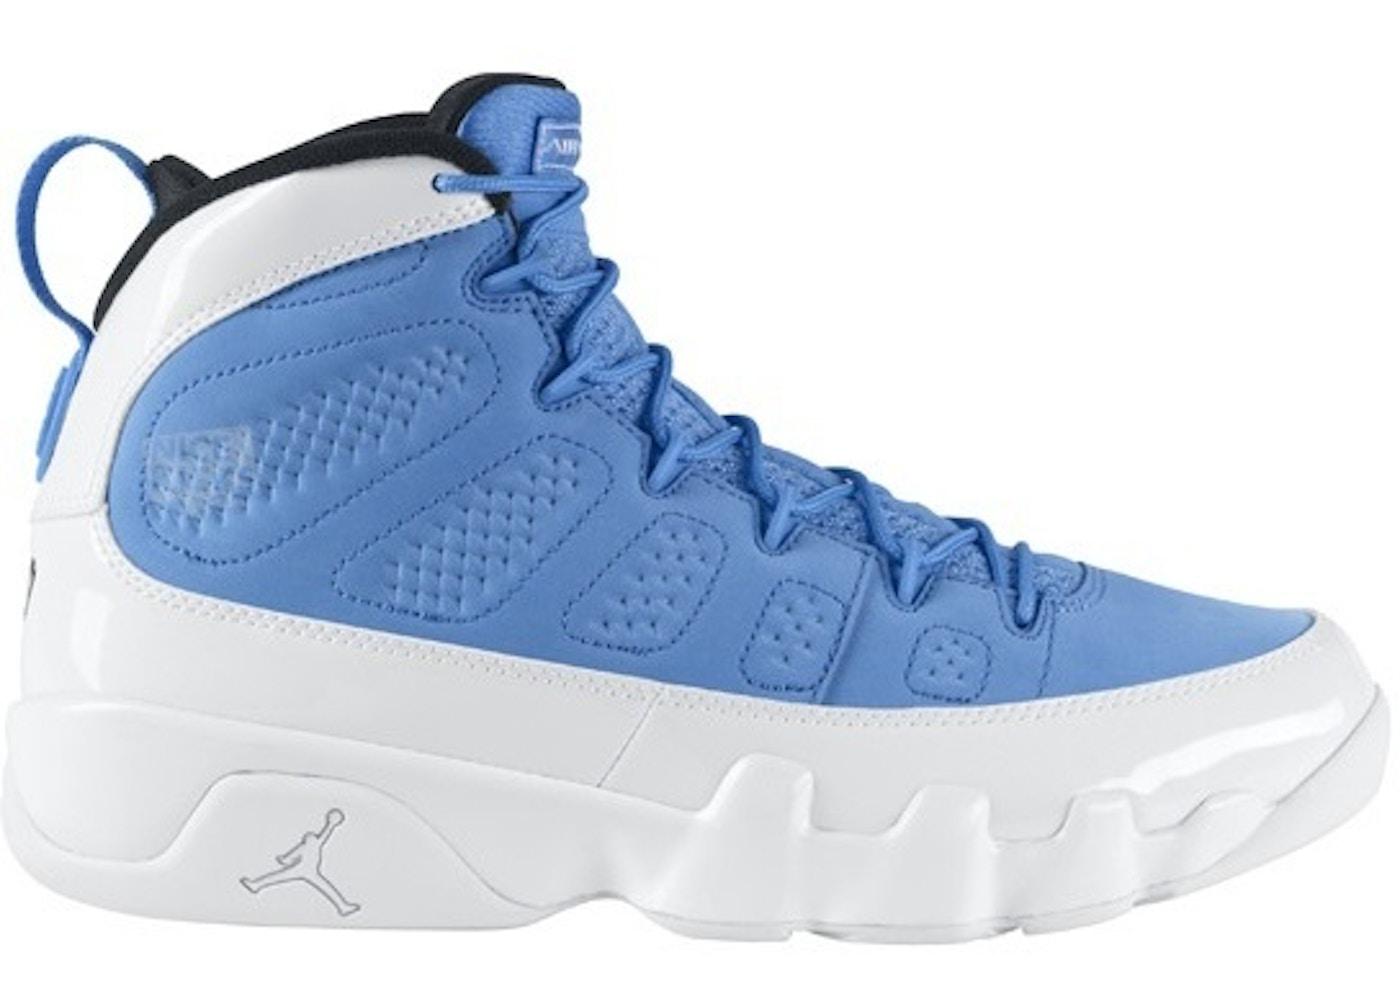 new styles 2f9cc 08c58 Air Jordan 9 Shoes - Average Sale Price